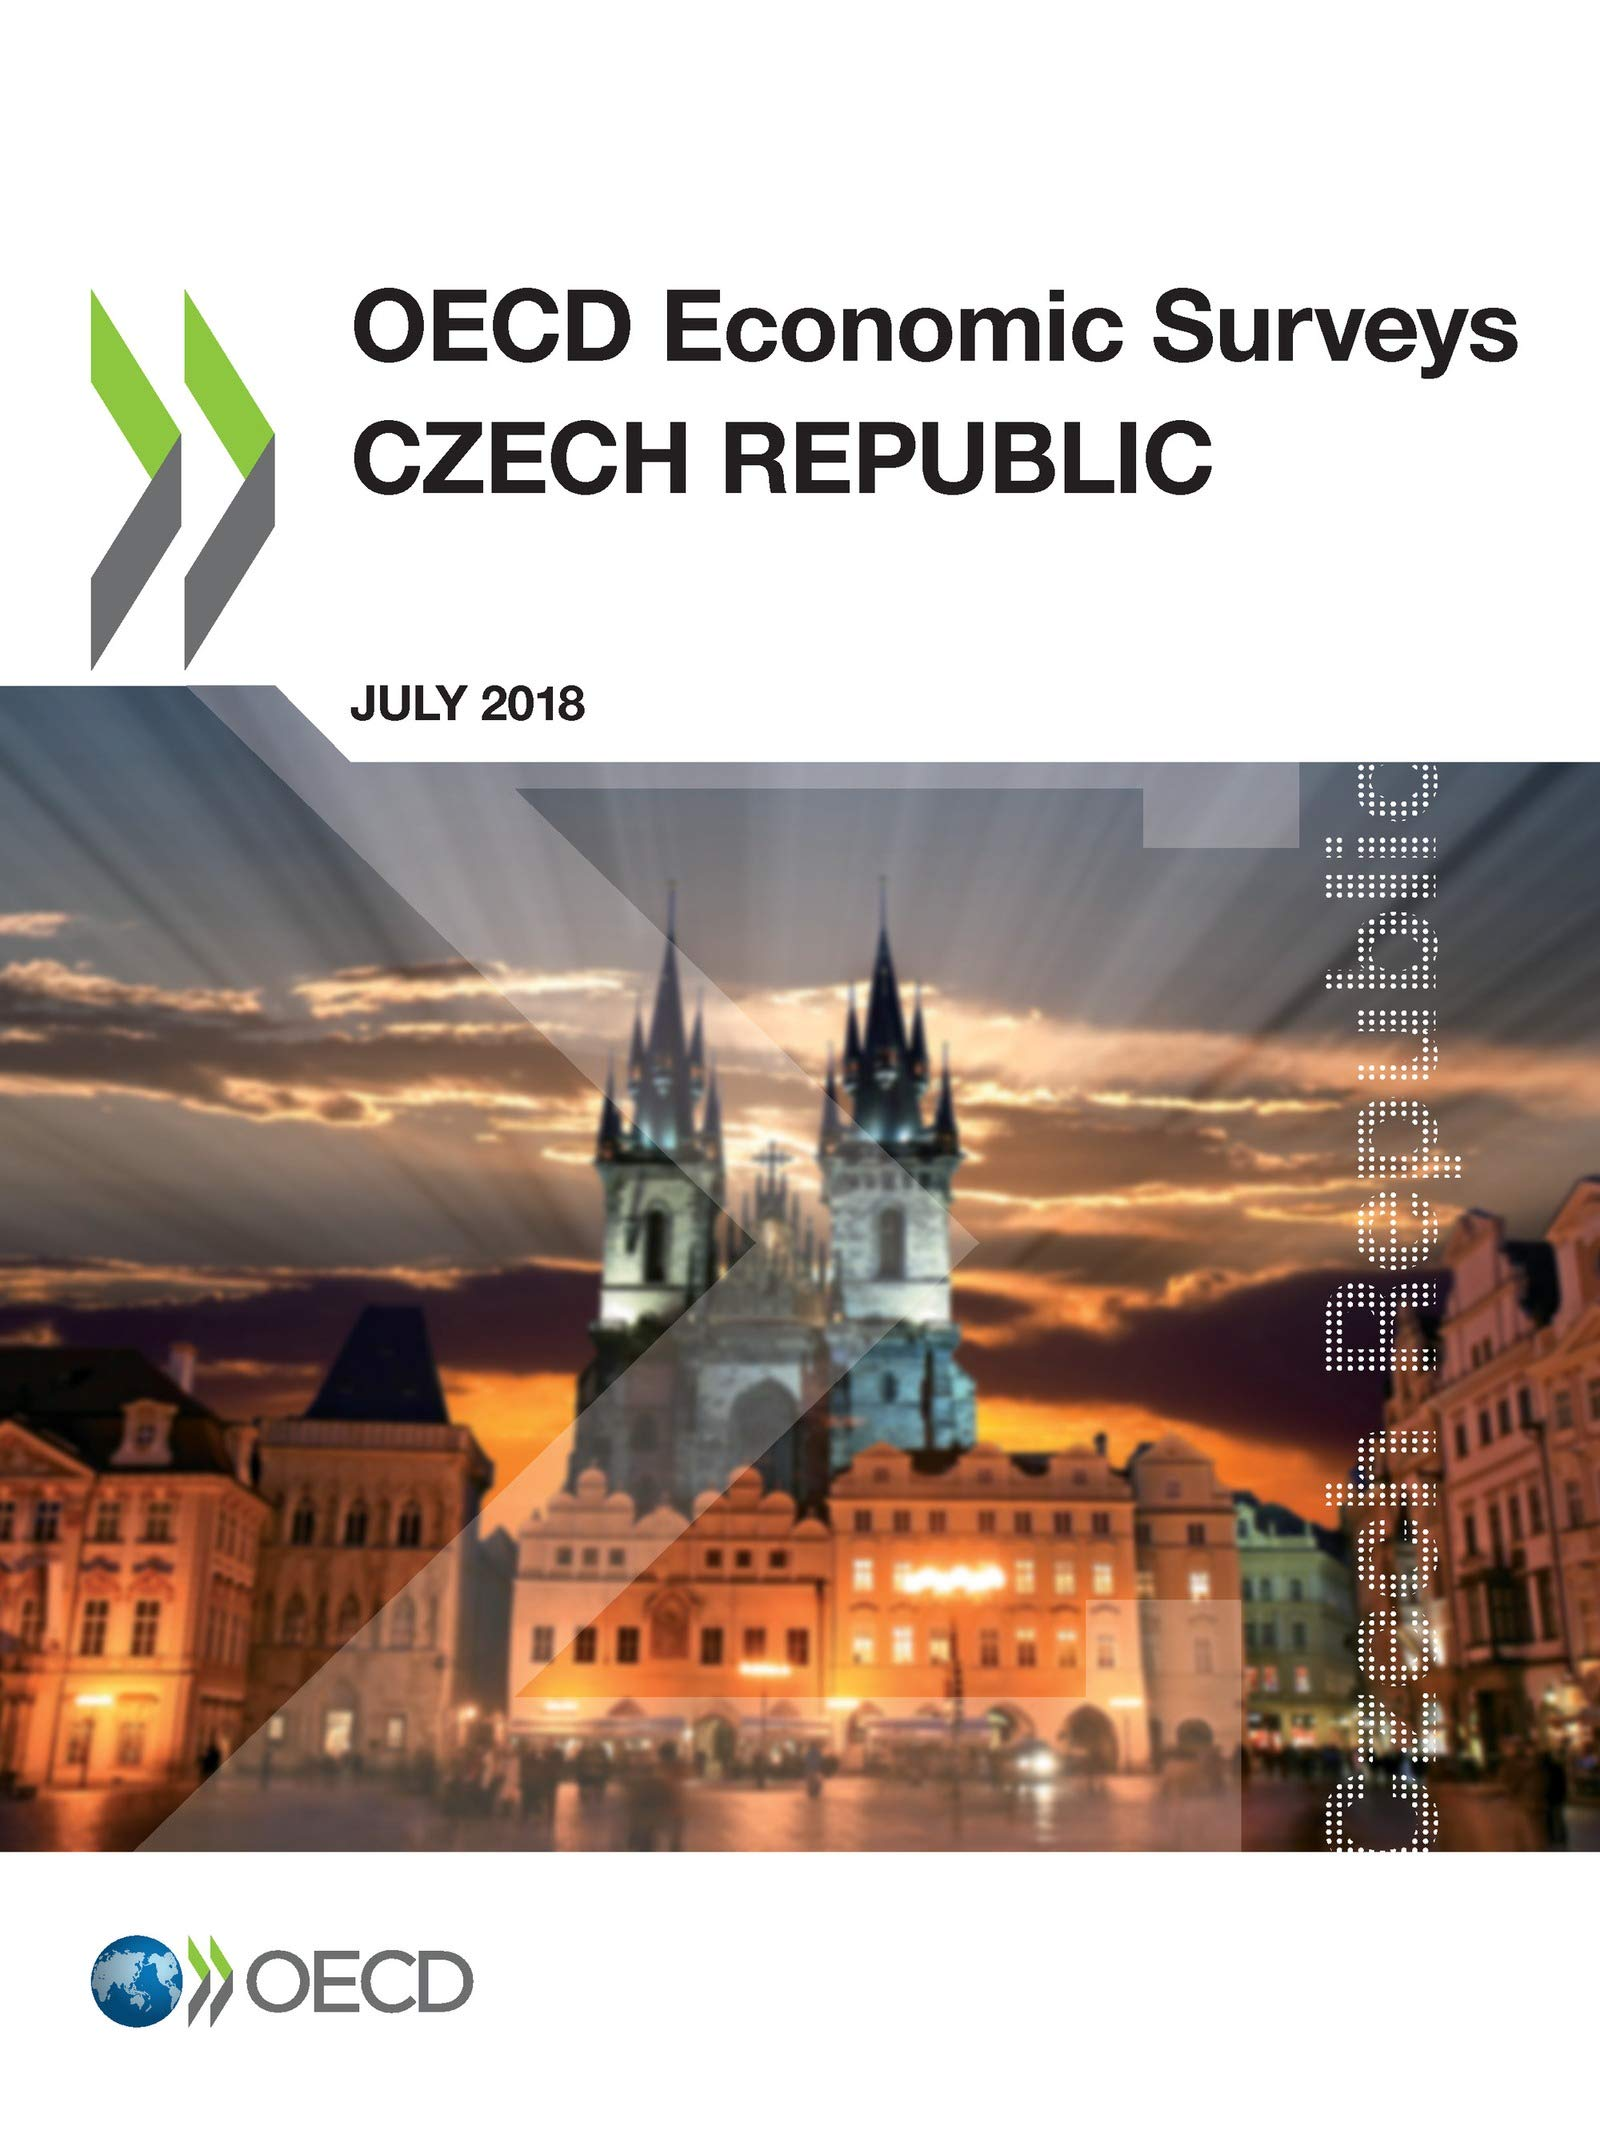 OECD Economic Surveys: Czech Republic 2018 (OECD Environmental Performance Reviews)